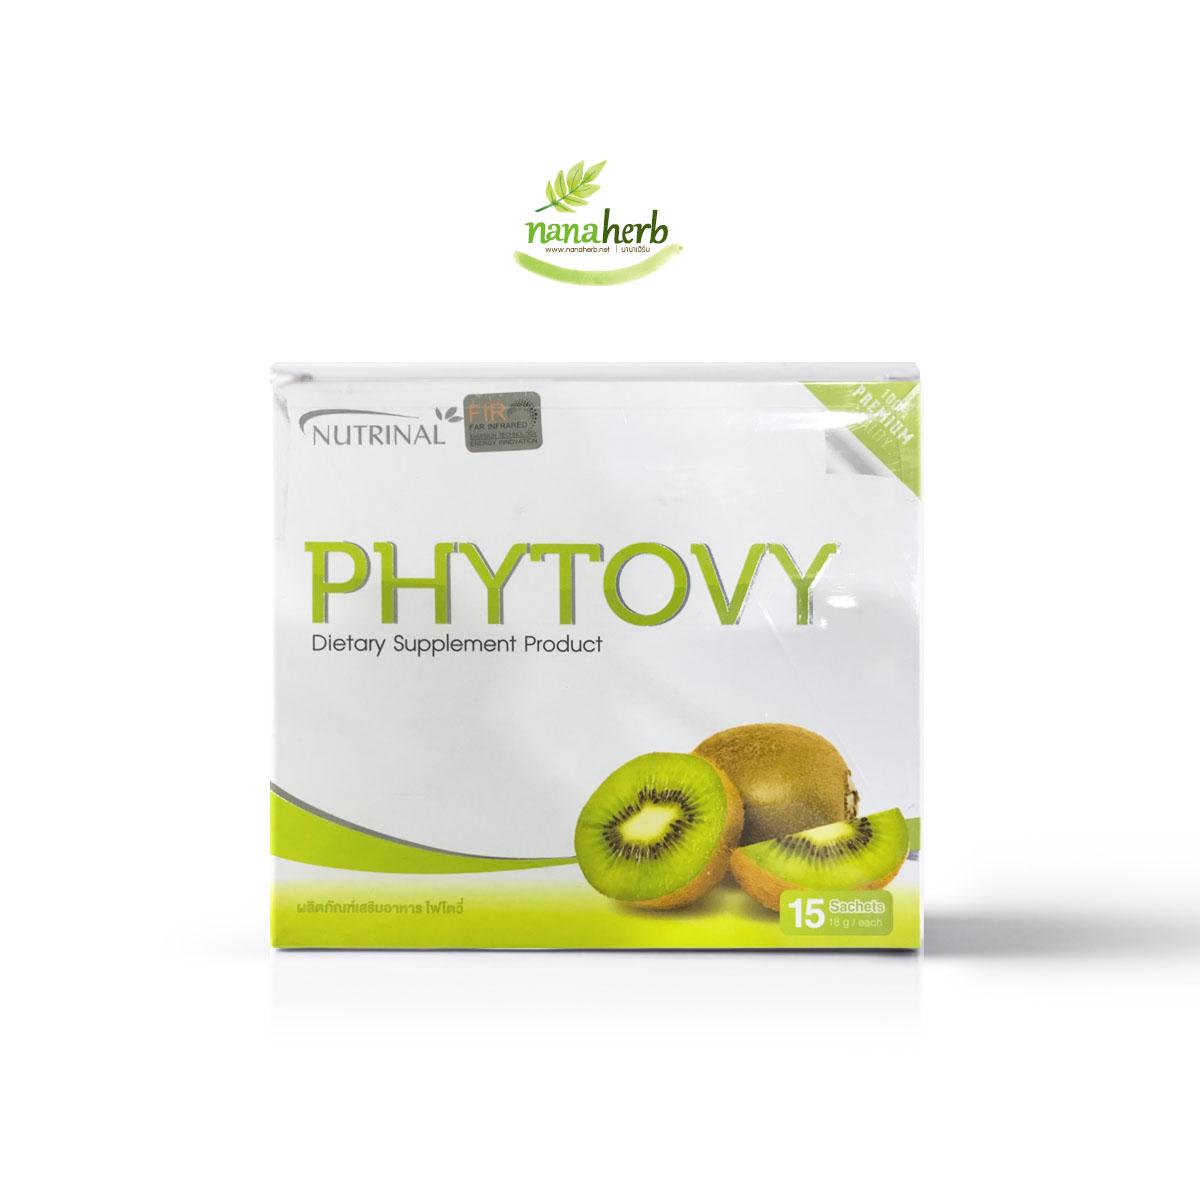 Phytovy (ไฟโตวี่)